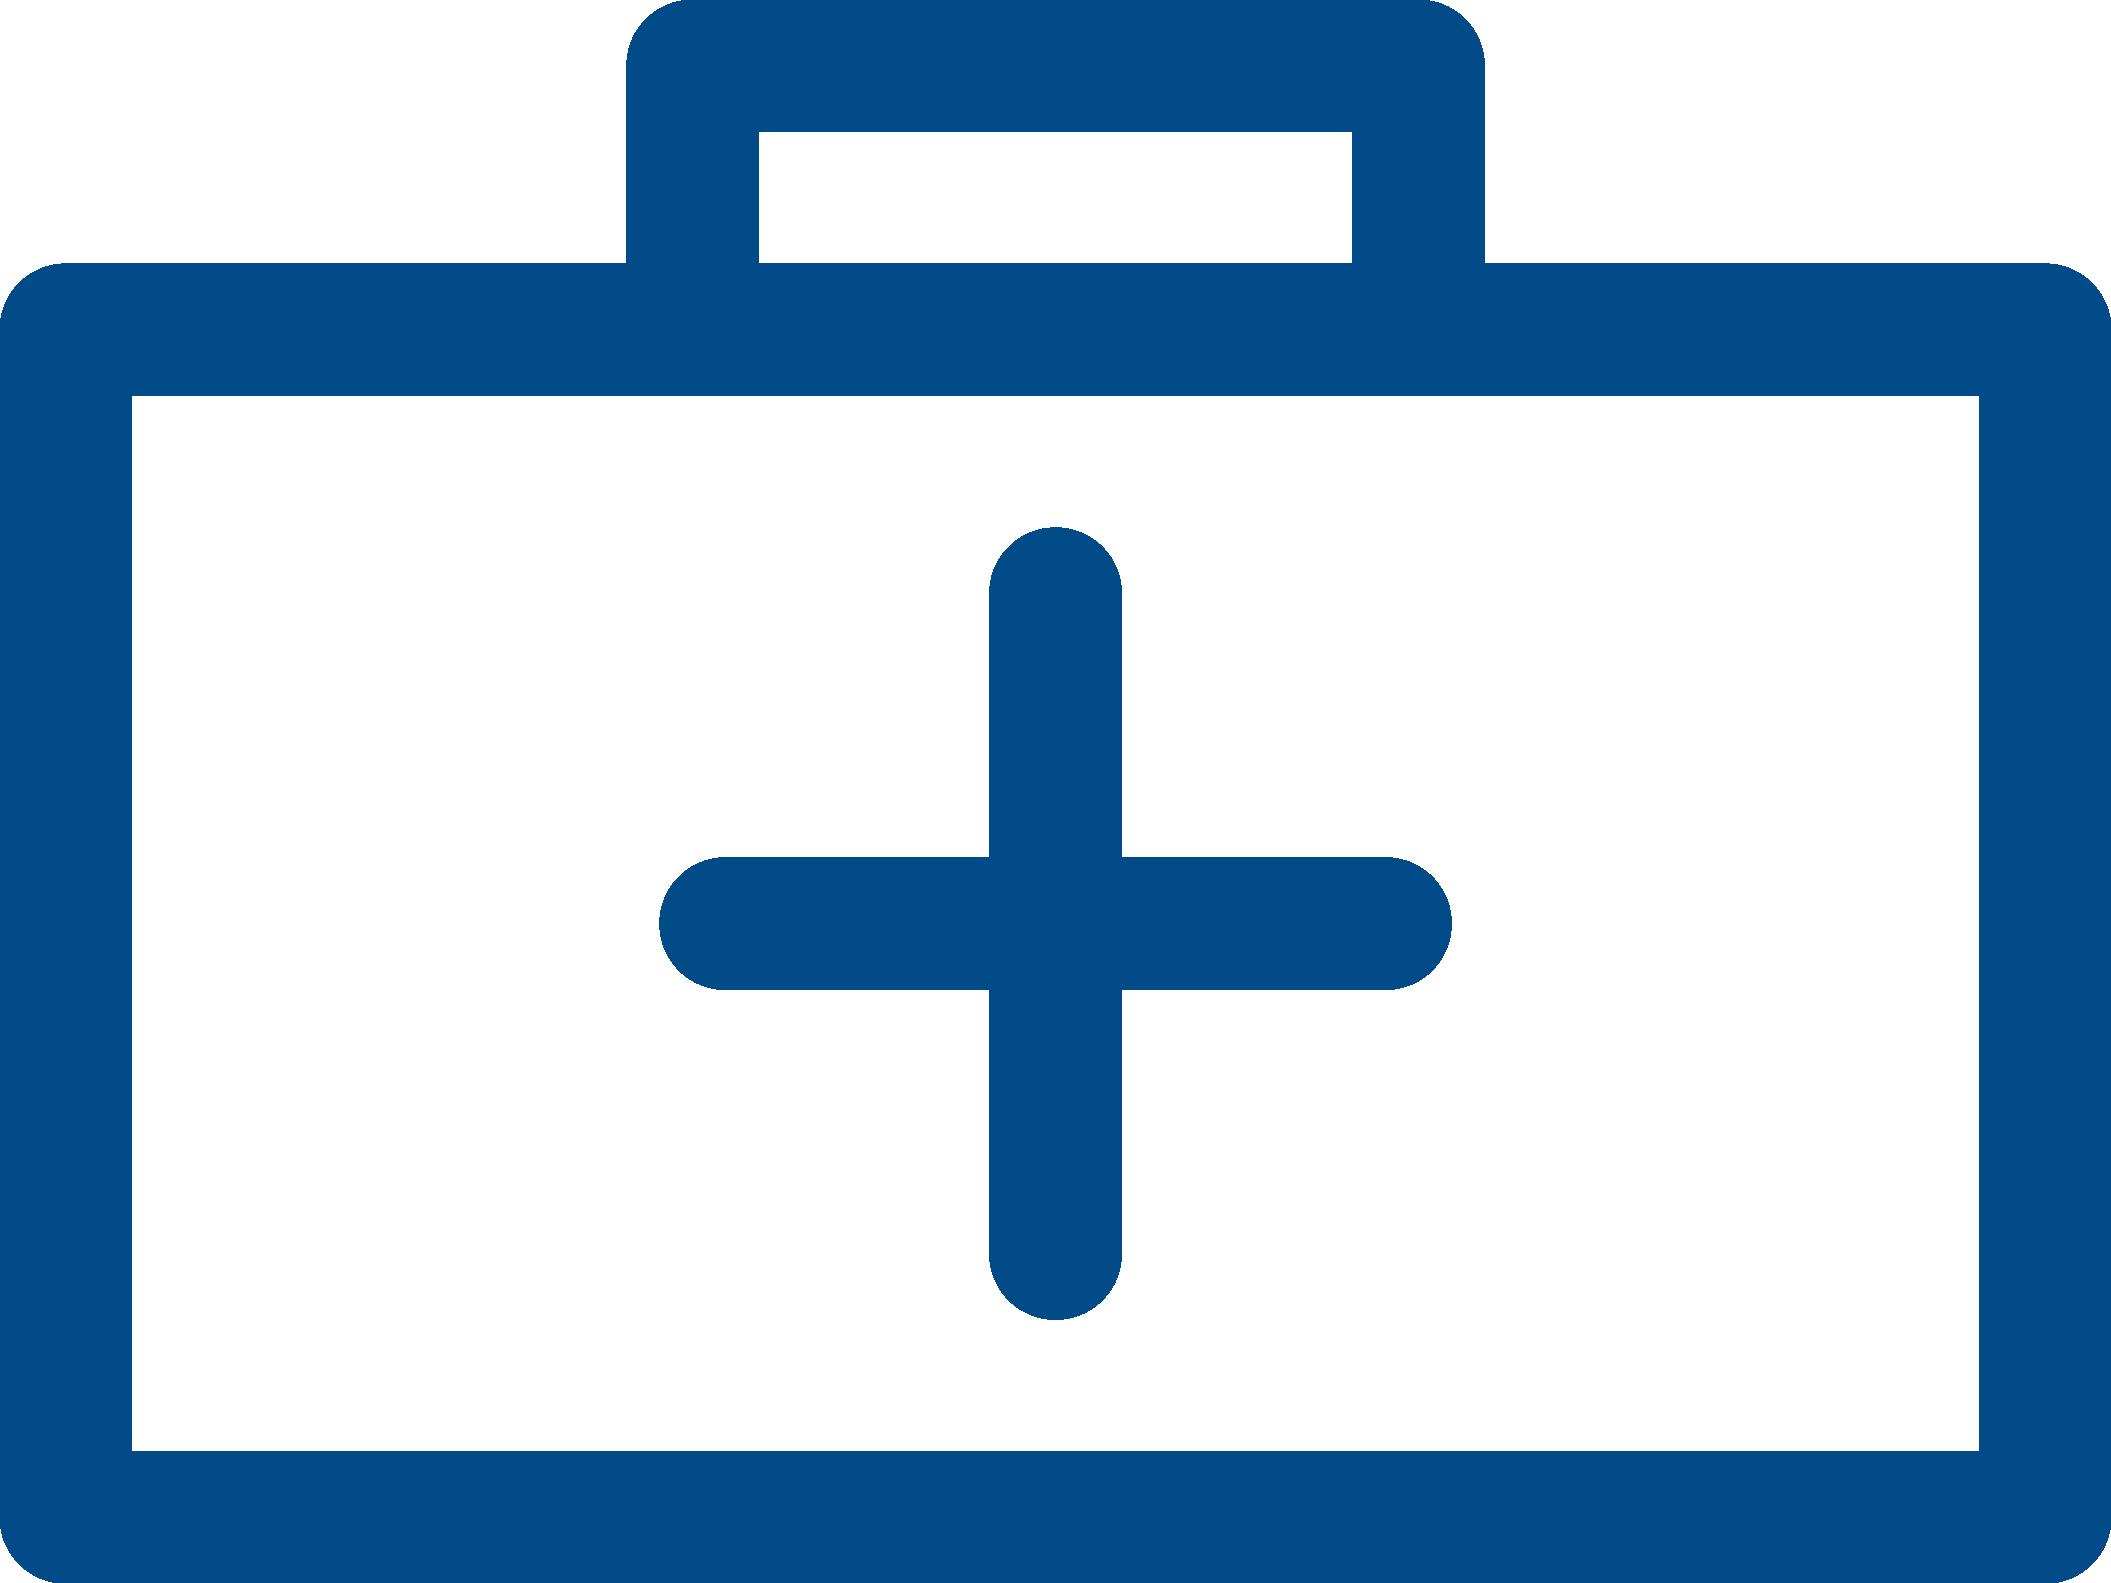 image icon of GP's briefcase